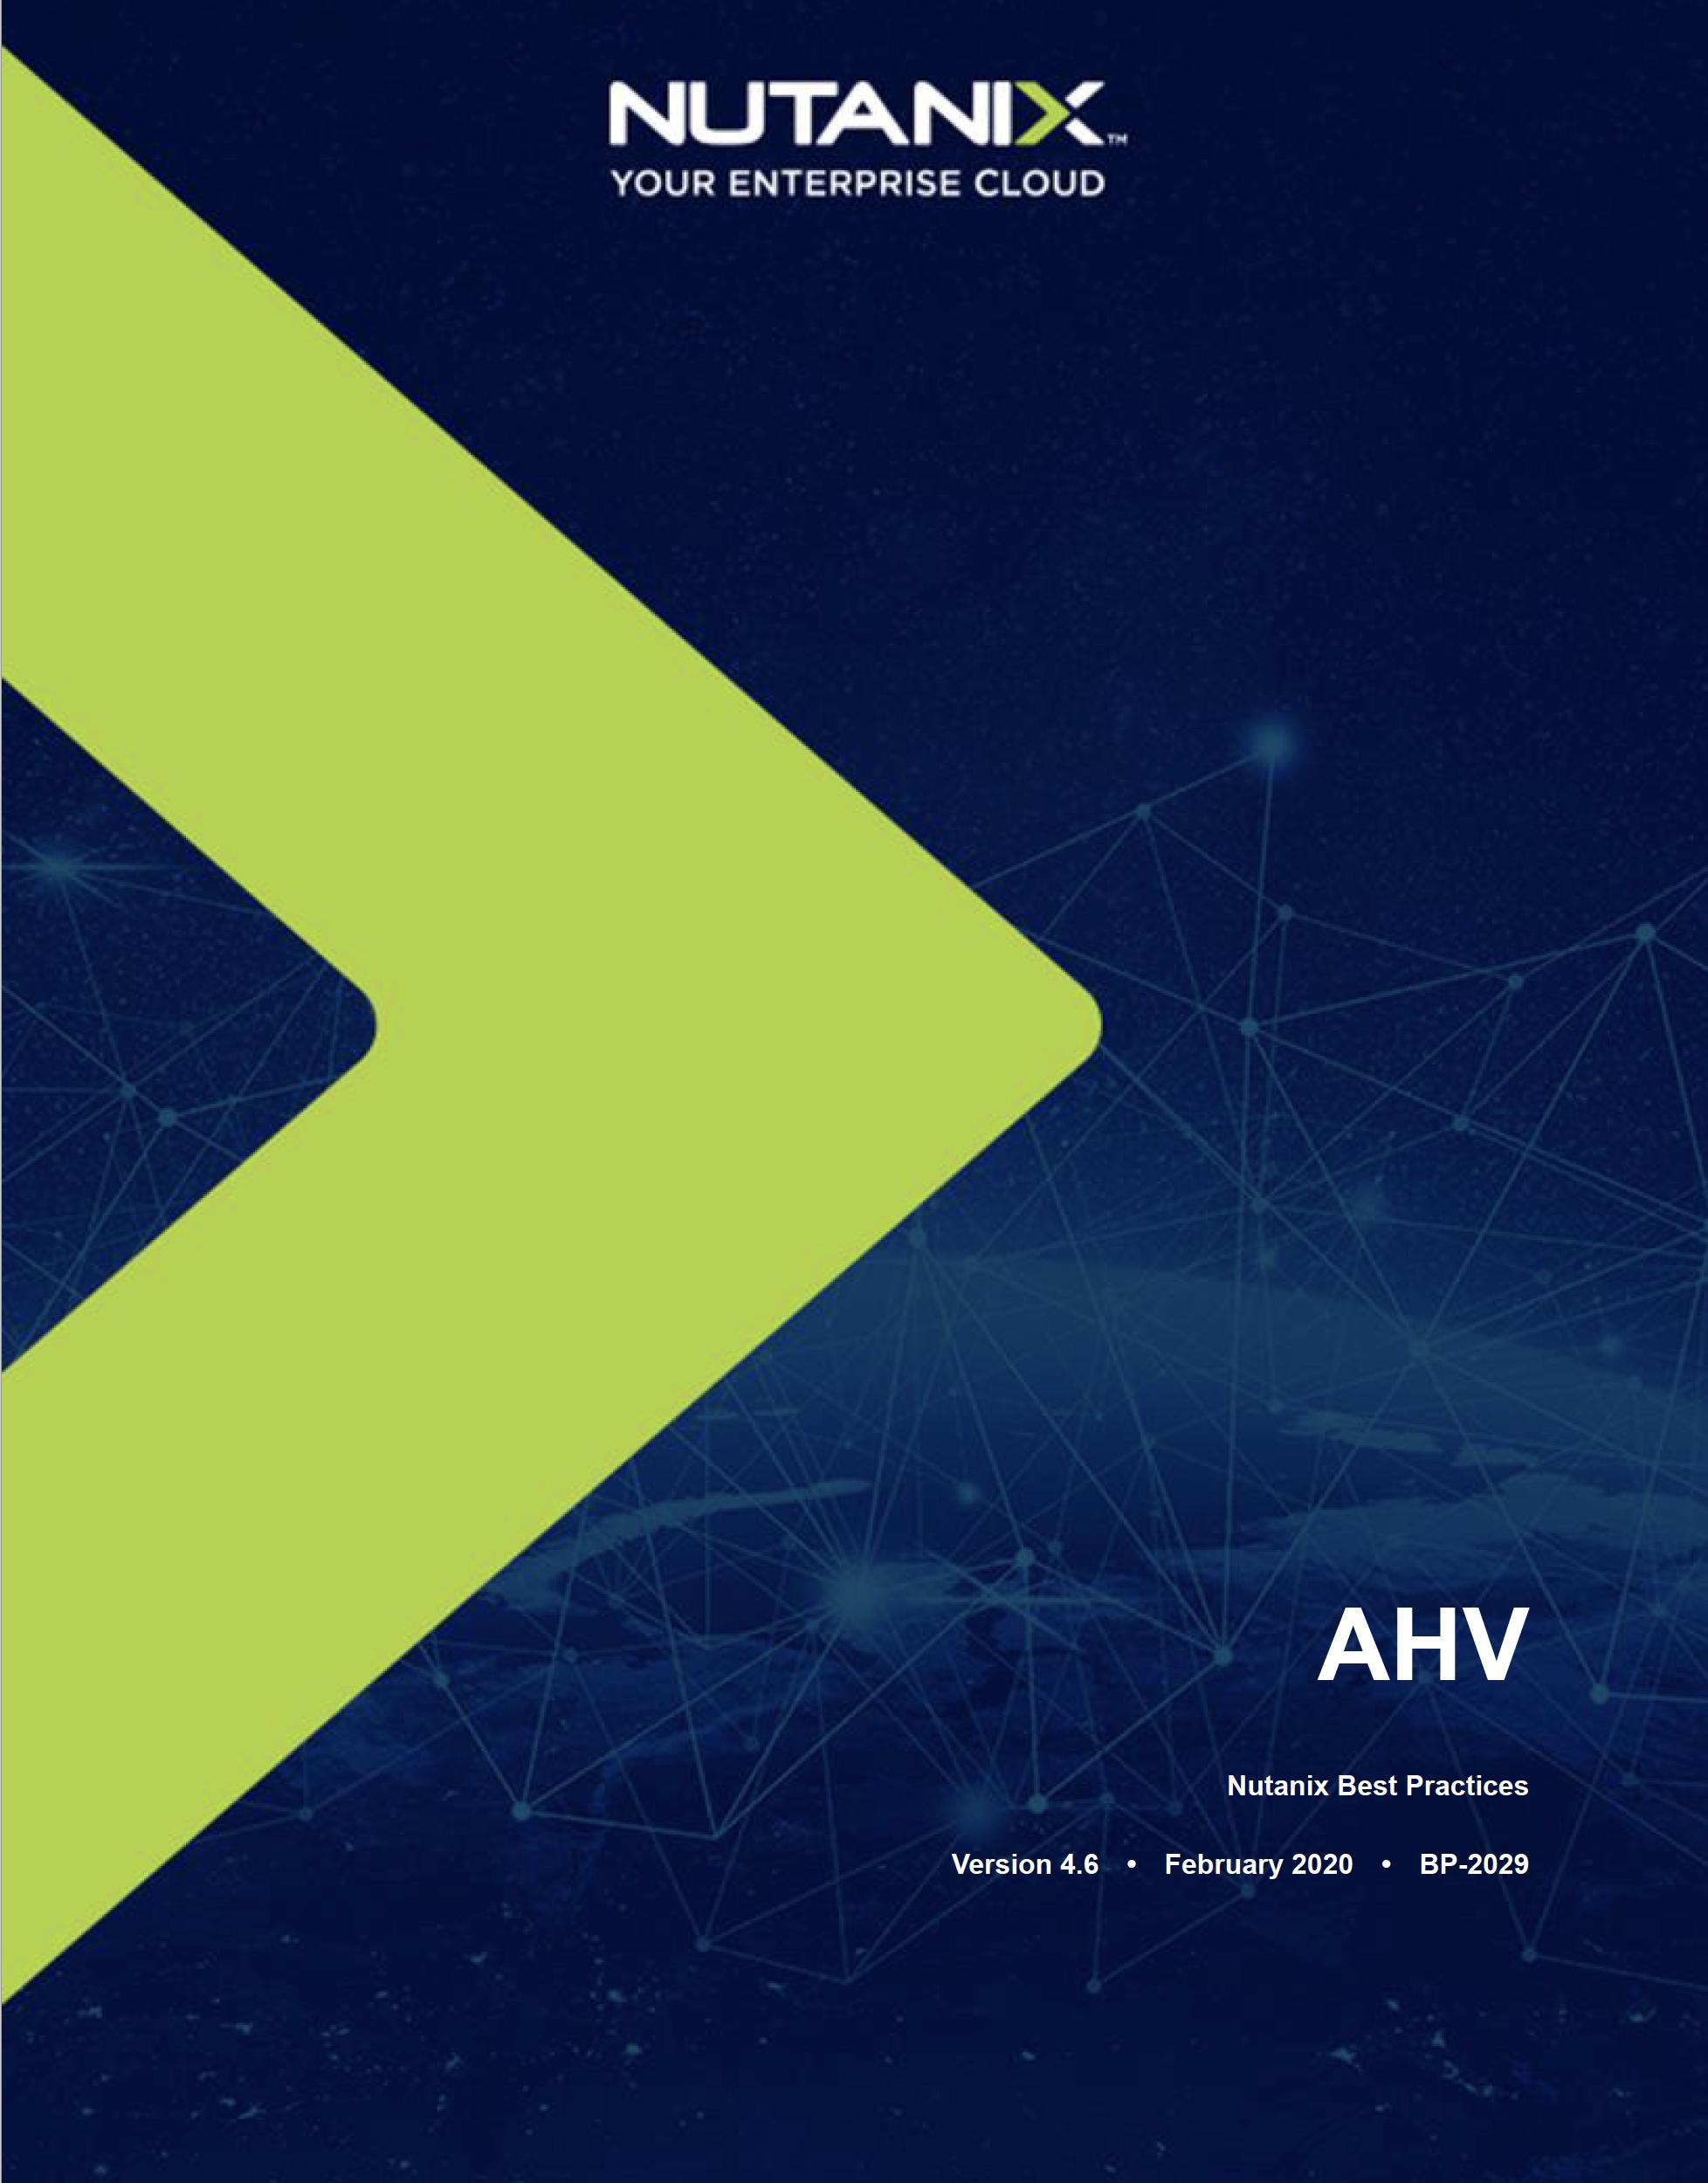 Nutanix AHV Doc Image